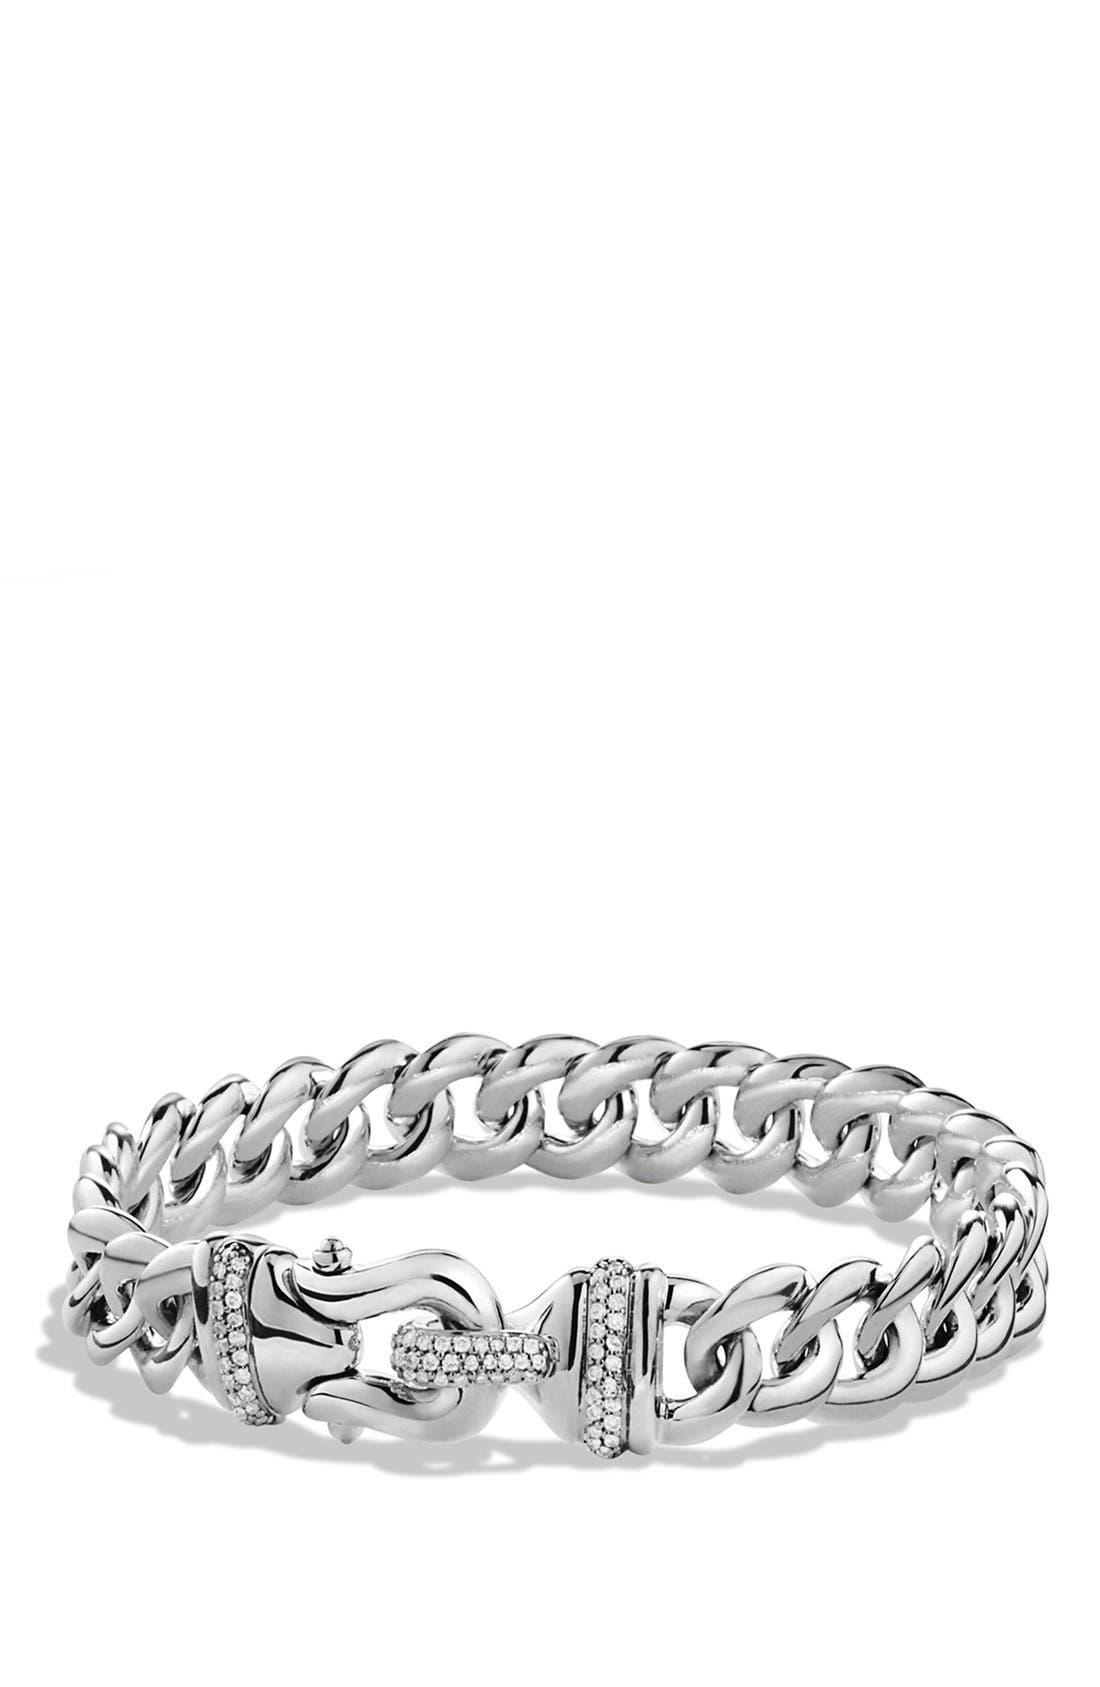 Main Image - David Yurman 'Buckle' Single-Row Bracelet with Diamonds